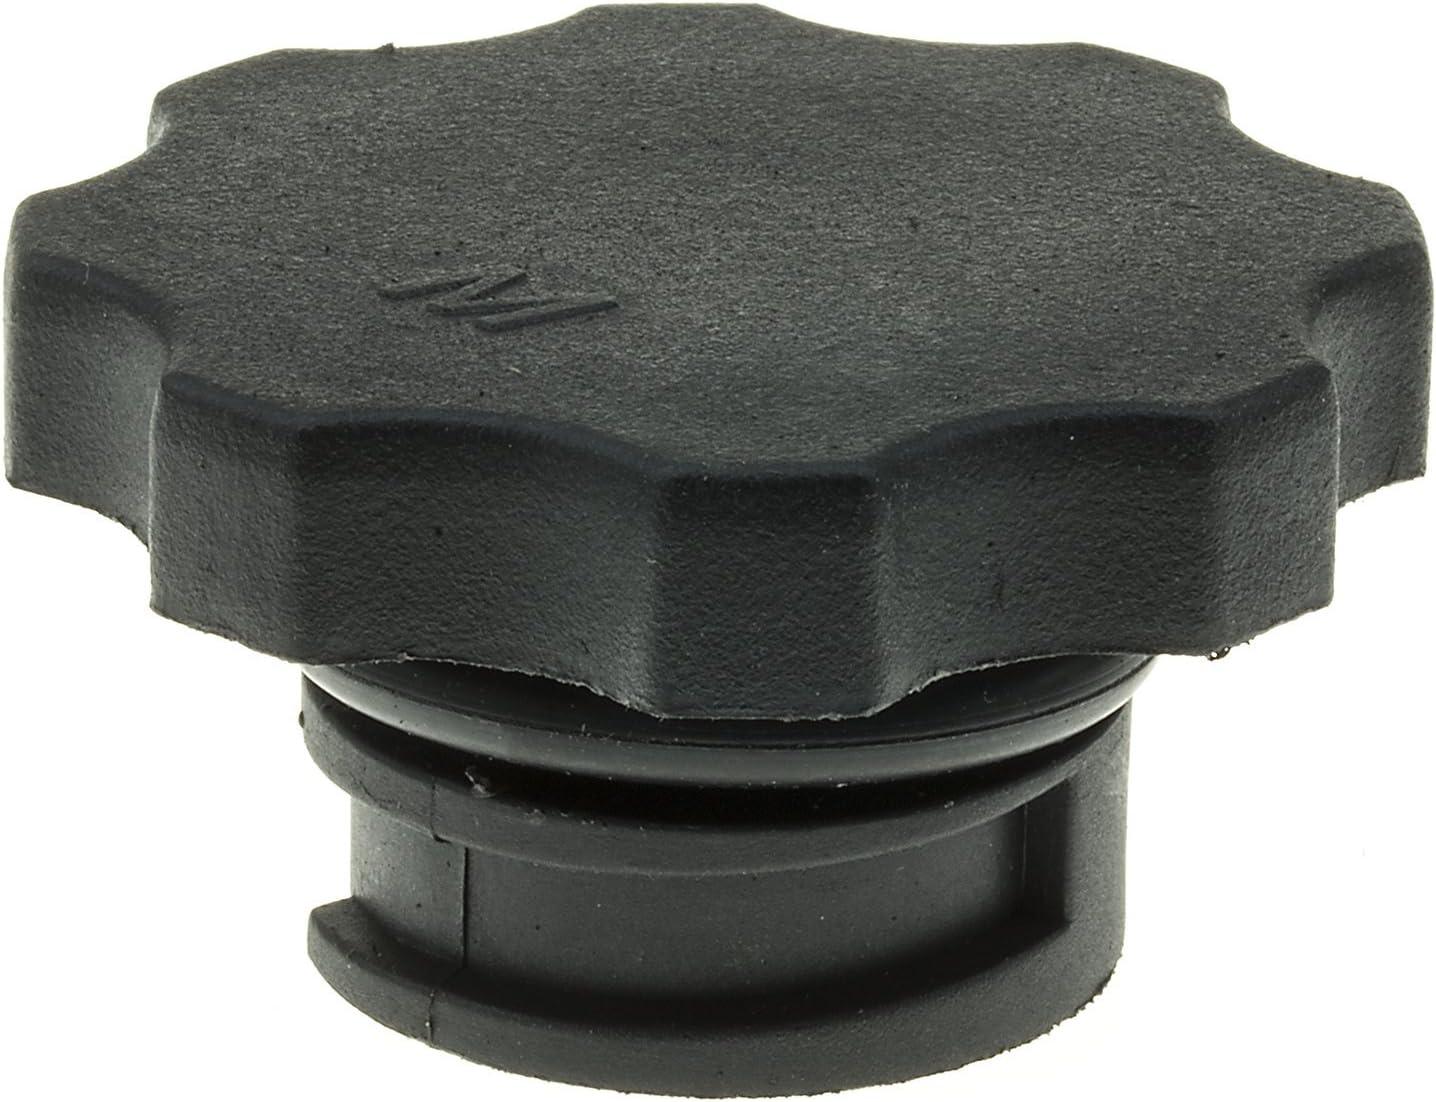 MotoRad MO-99 Oil Filler Cap